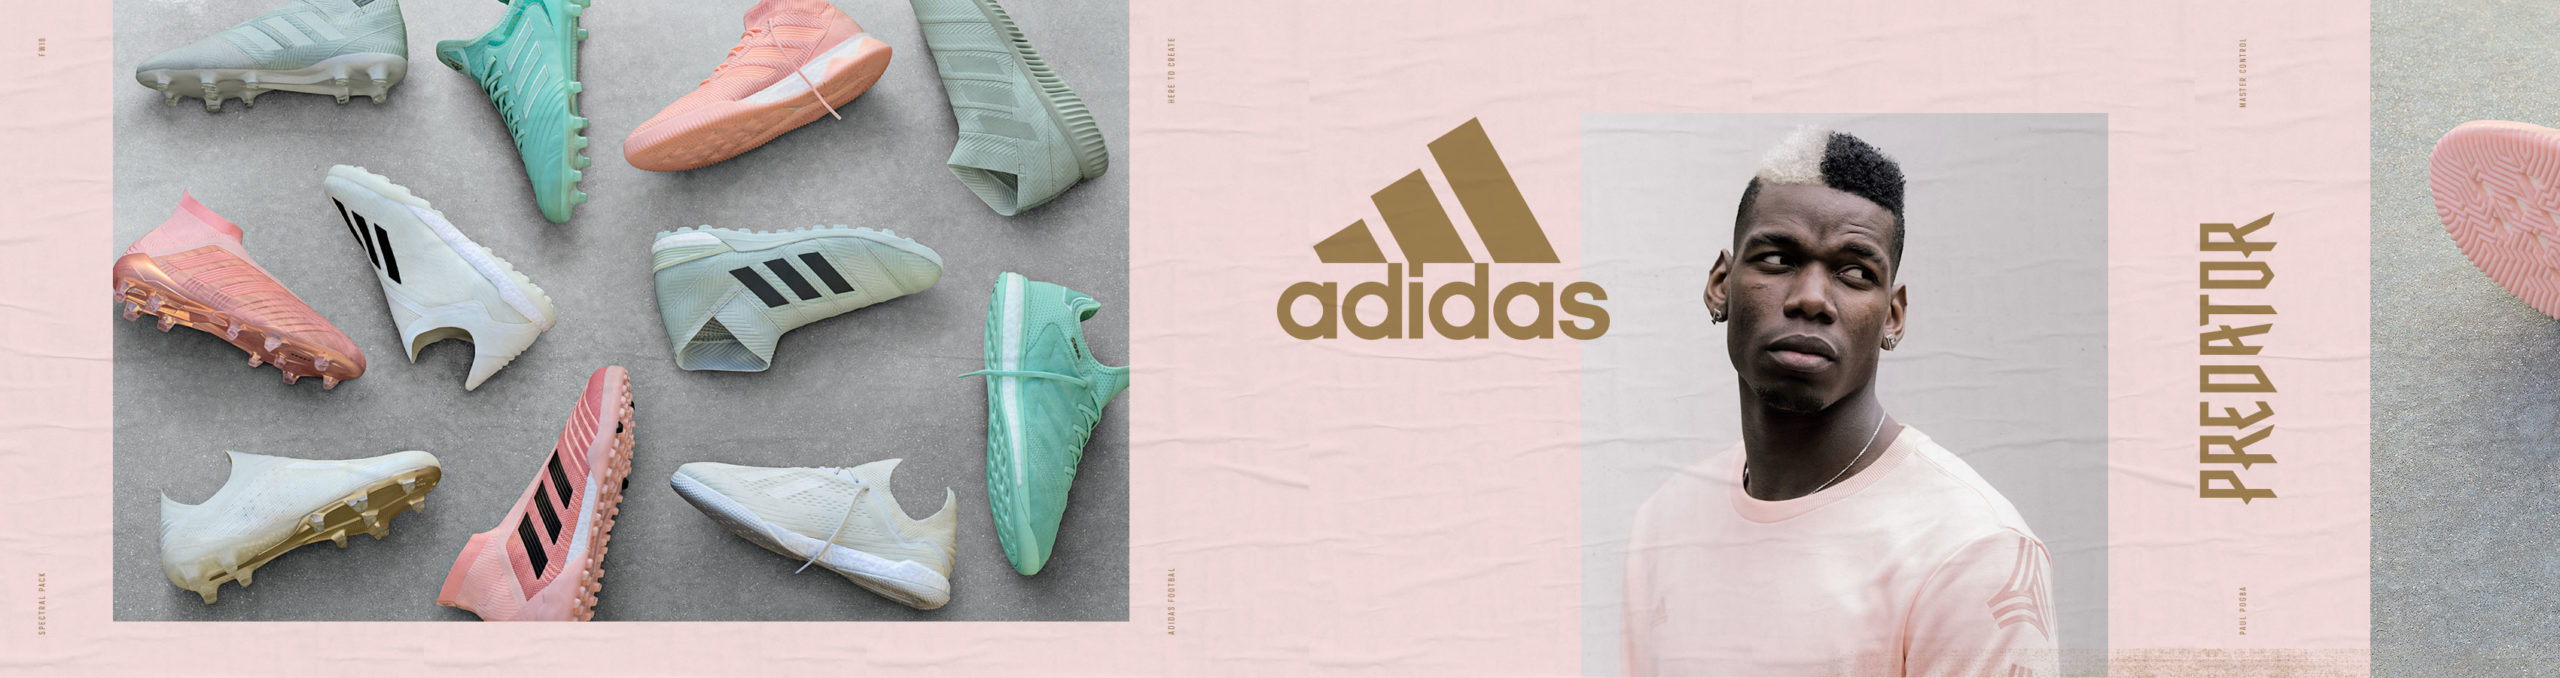 RobsonUnited2020_adidasFW18_Spectral01